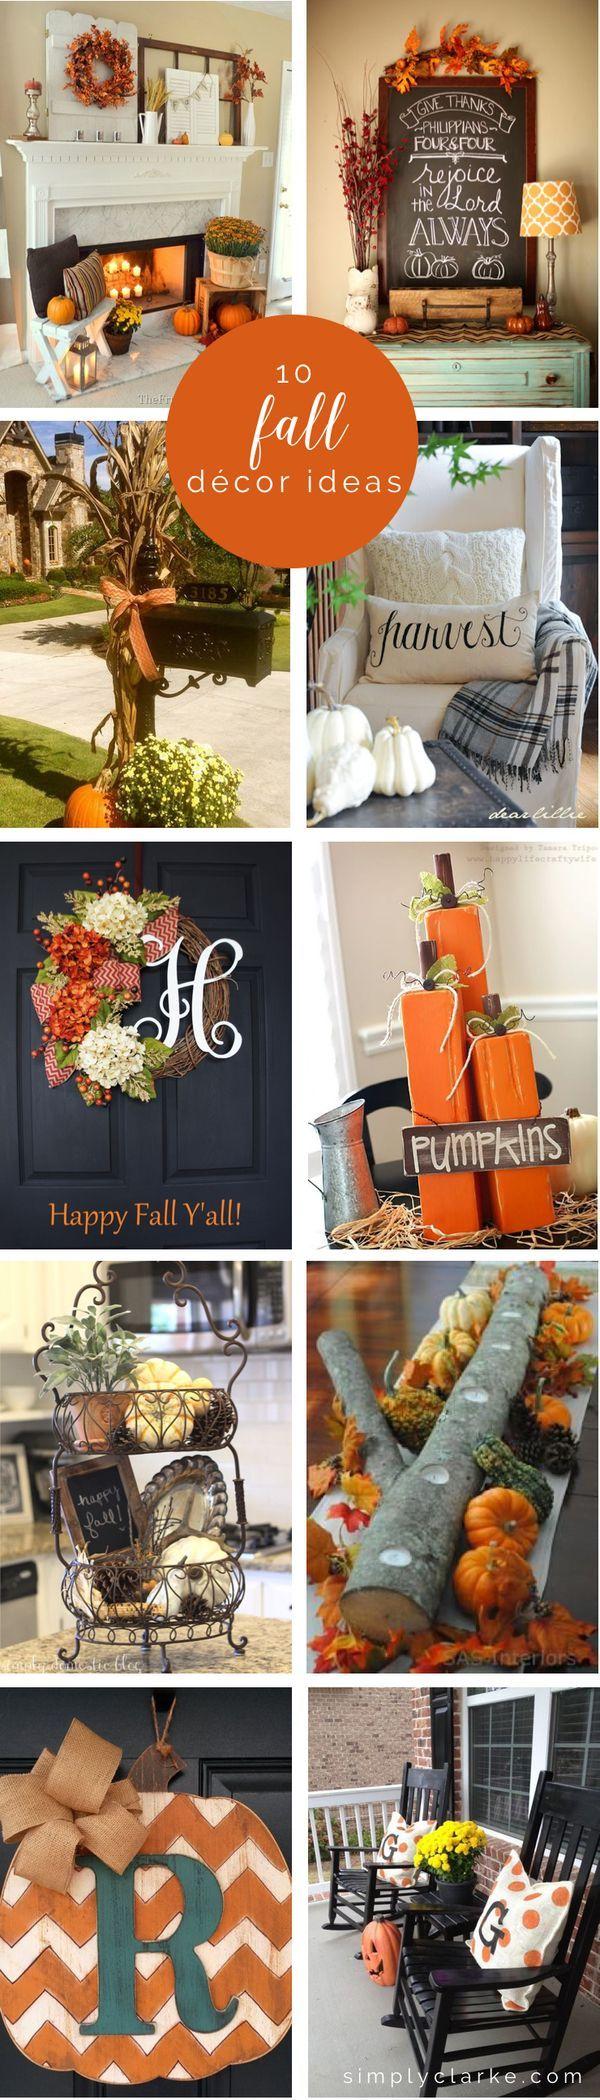 10 Fall Decor Ideas | Inspiration, Holidays and Autumn